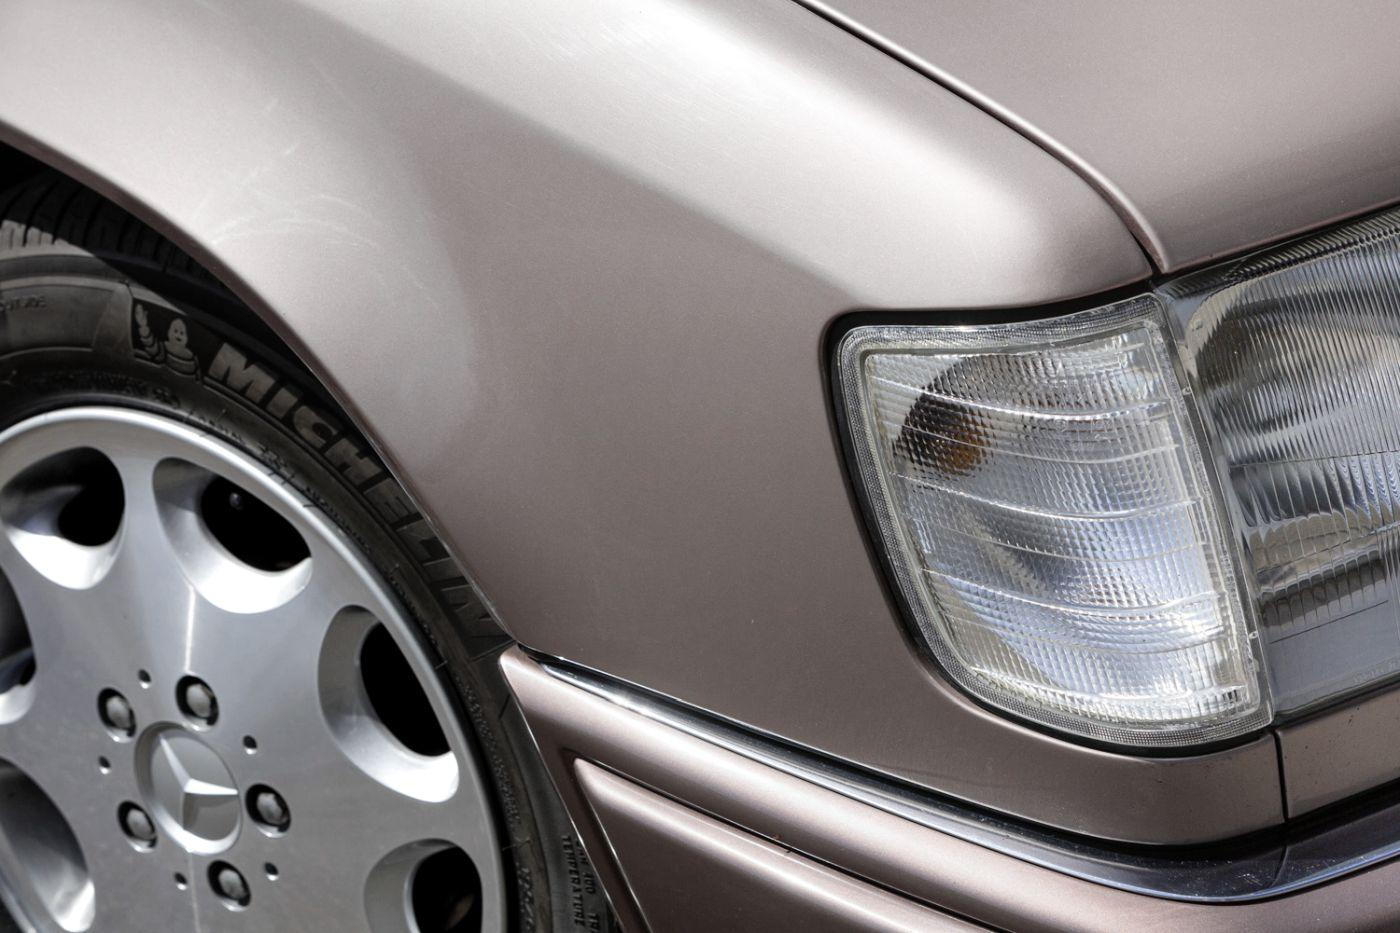 Mercedes-Benz C 124 Coupe (7)